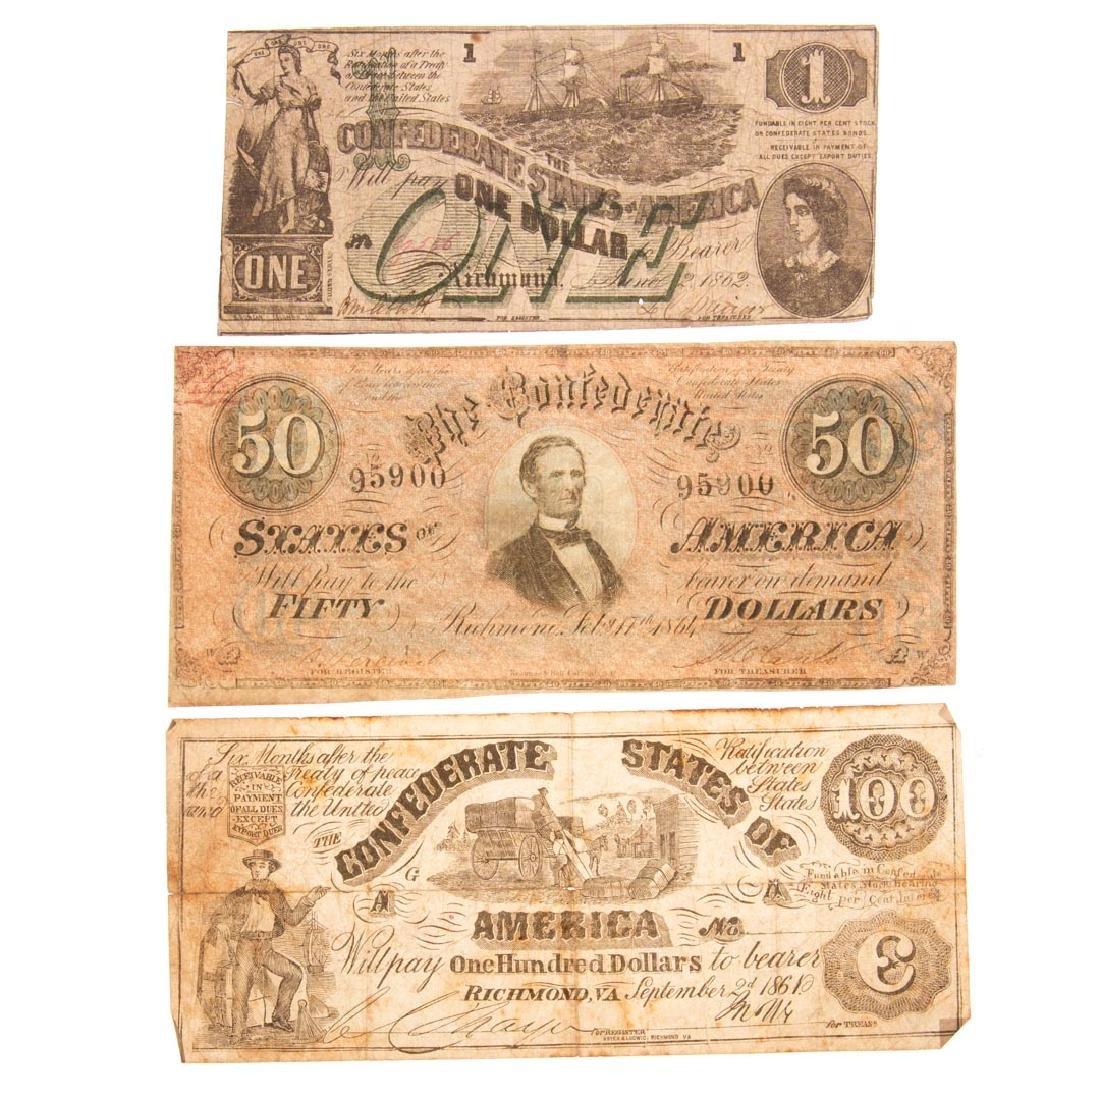 [US} Several Scarce Confederate Notes